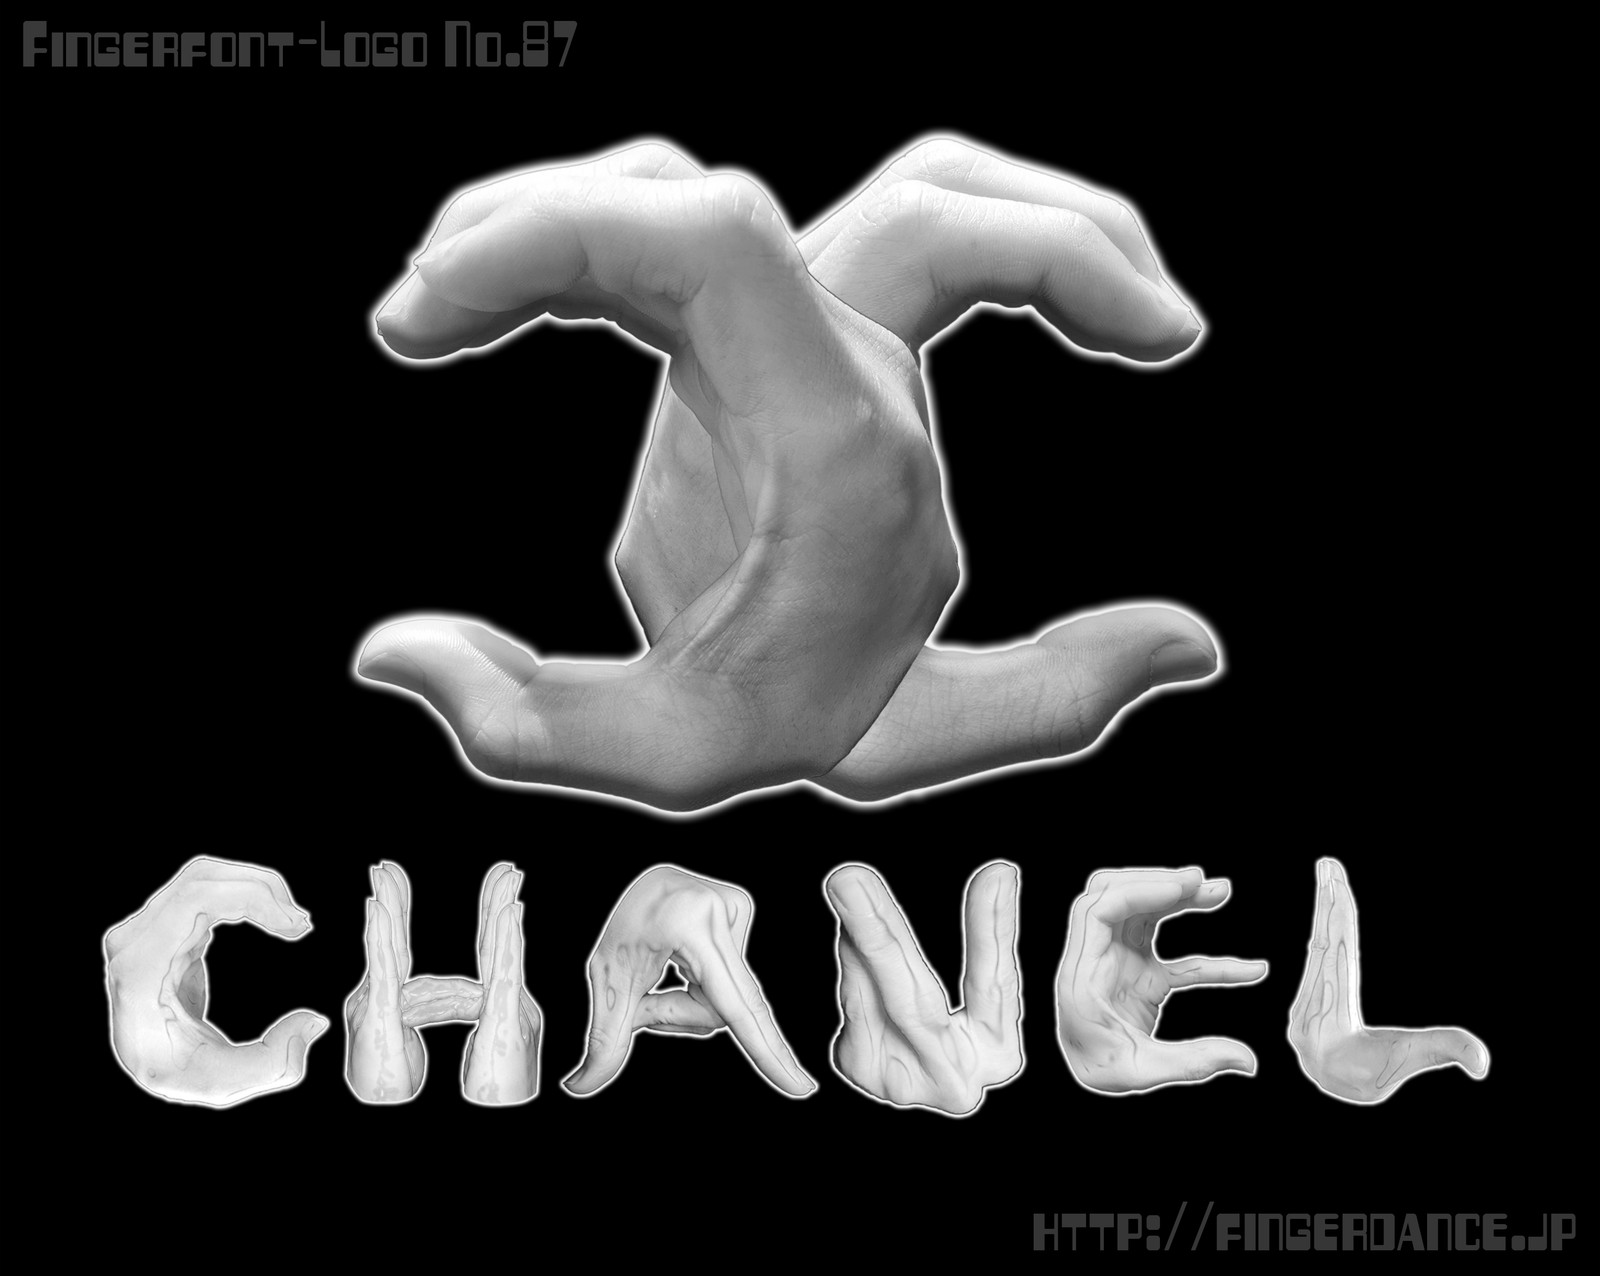 chanel-fingerhttp://fingerdance.jp/L/logohand シャネル・フィンガーロゴハンド手指